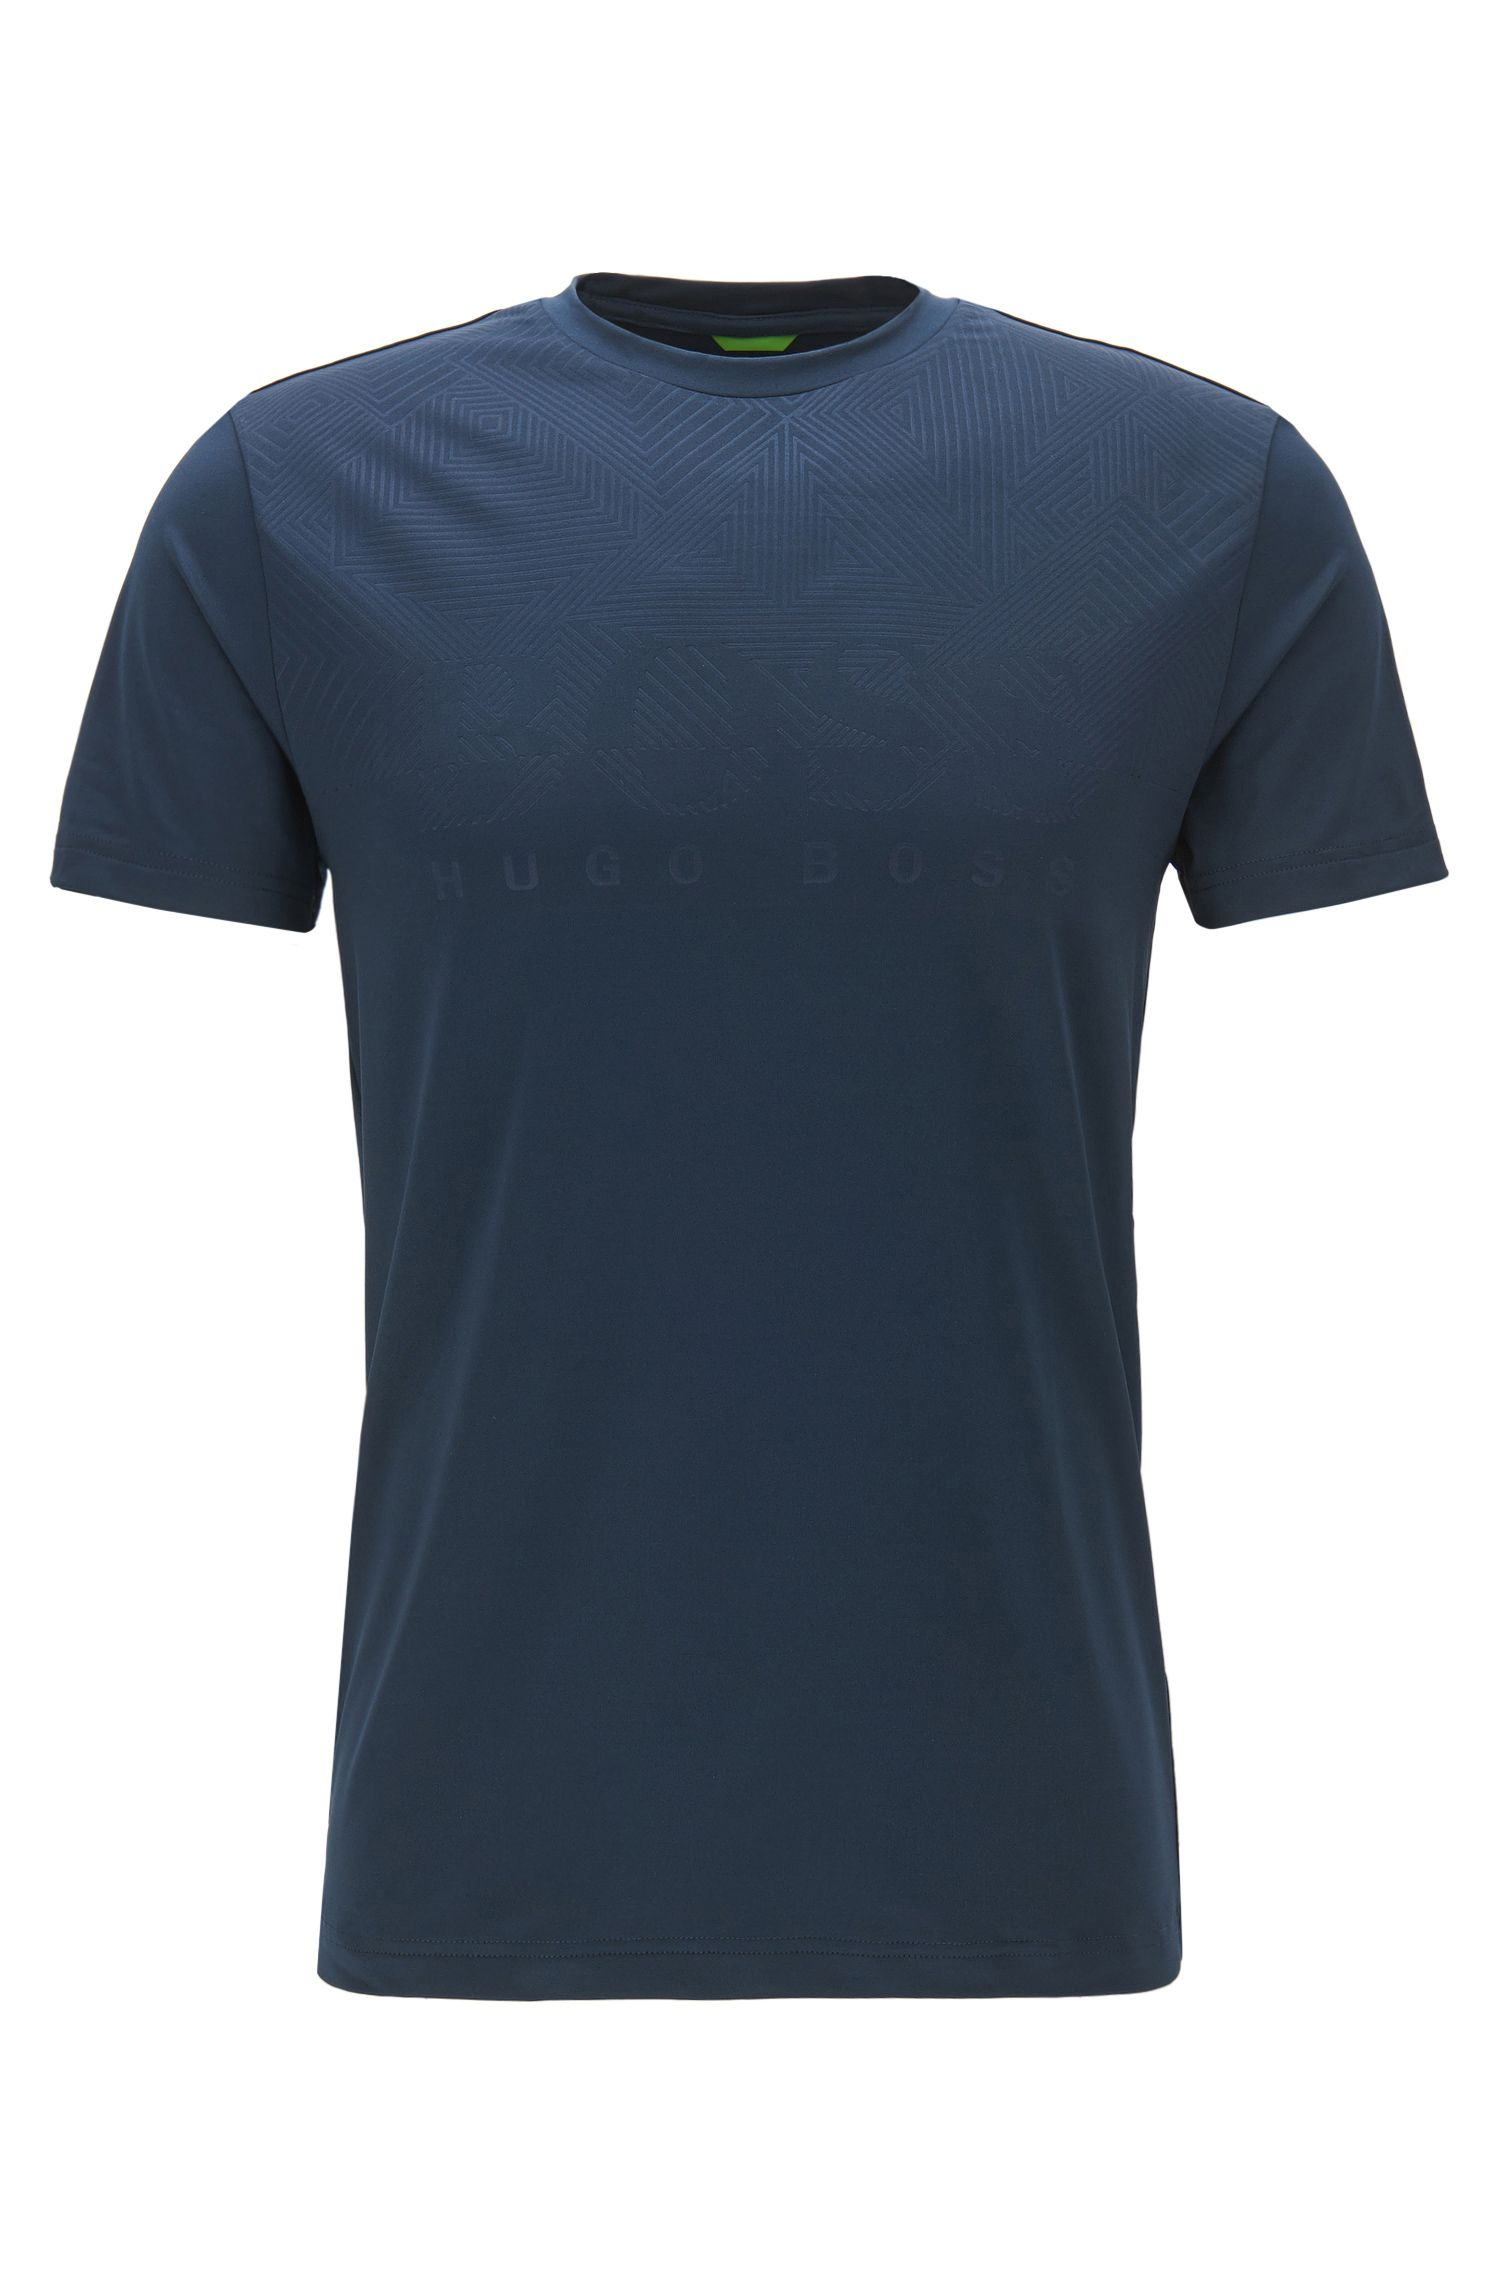 Slim-fit T-shirt van technisch stretchmateriaal